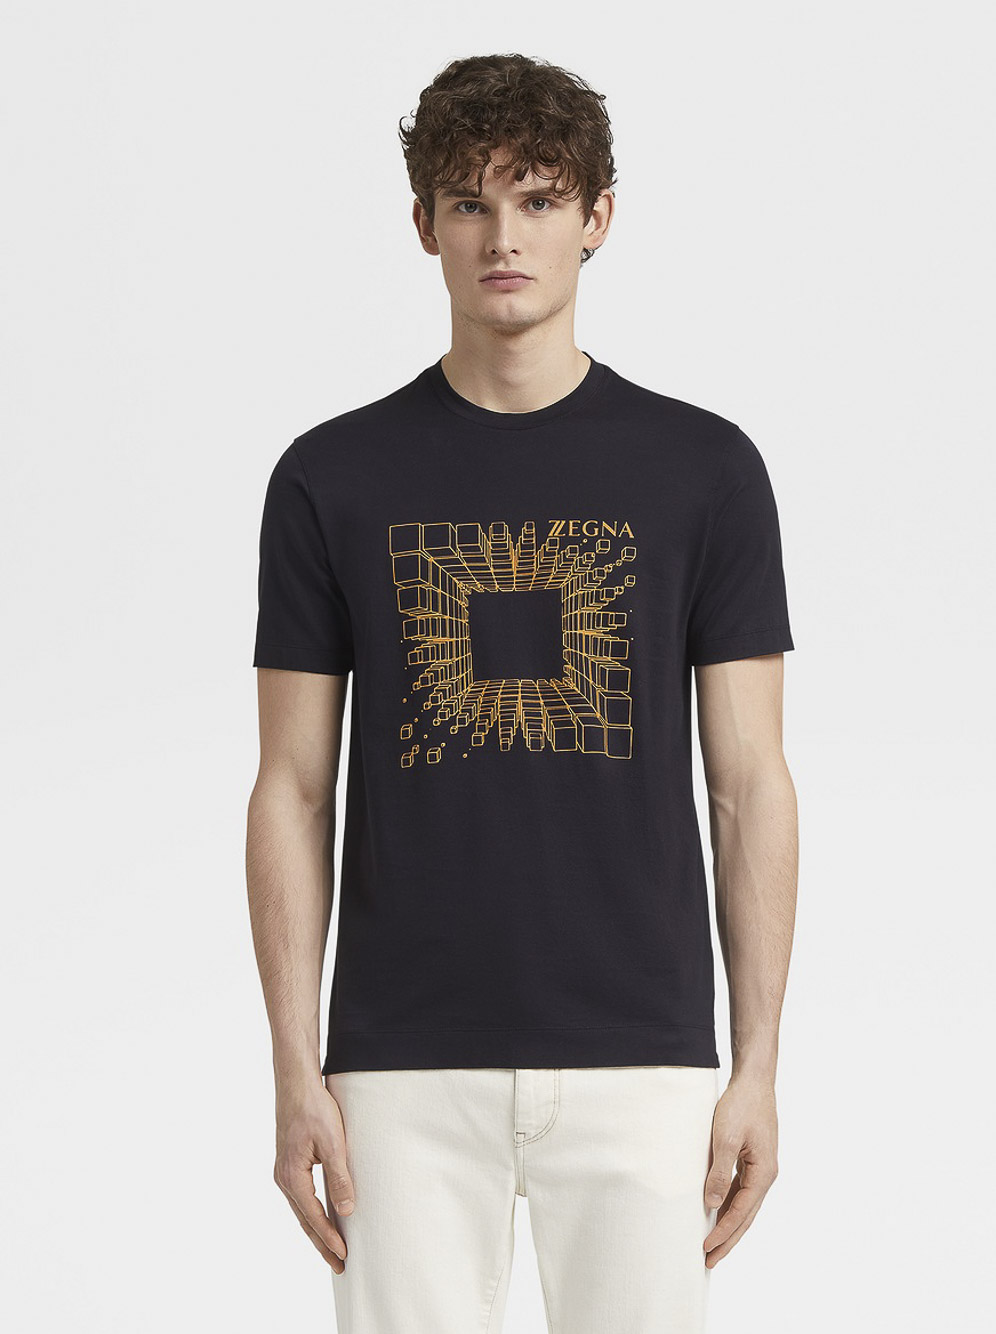 ZEGNA Μπλούζα Τ-shirt ZZ630R-6R3 ΜΠΛΕ